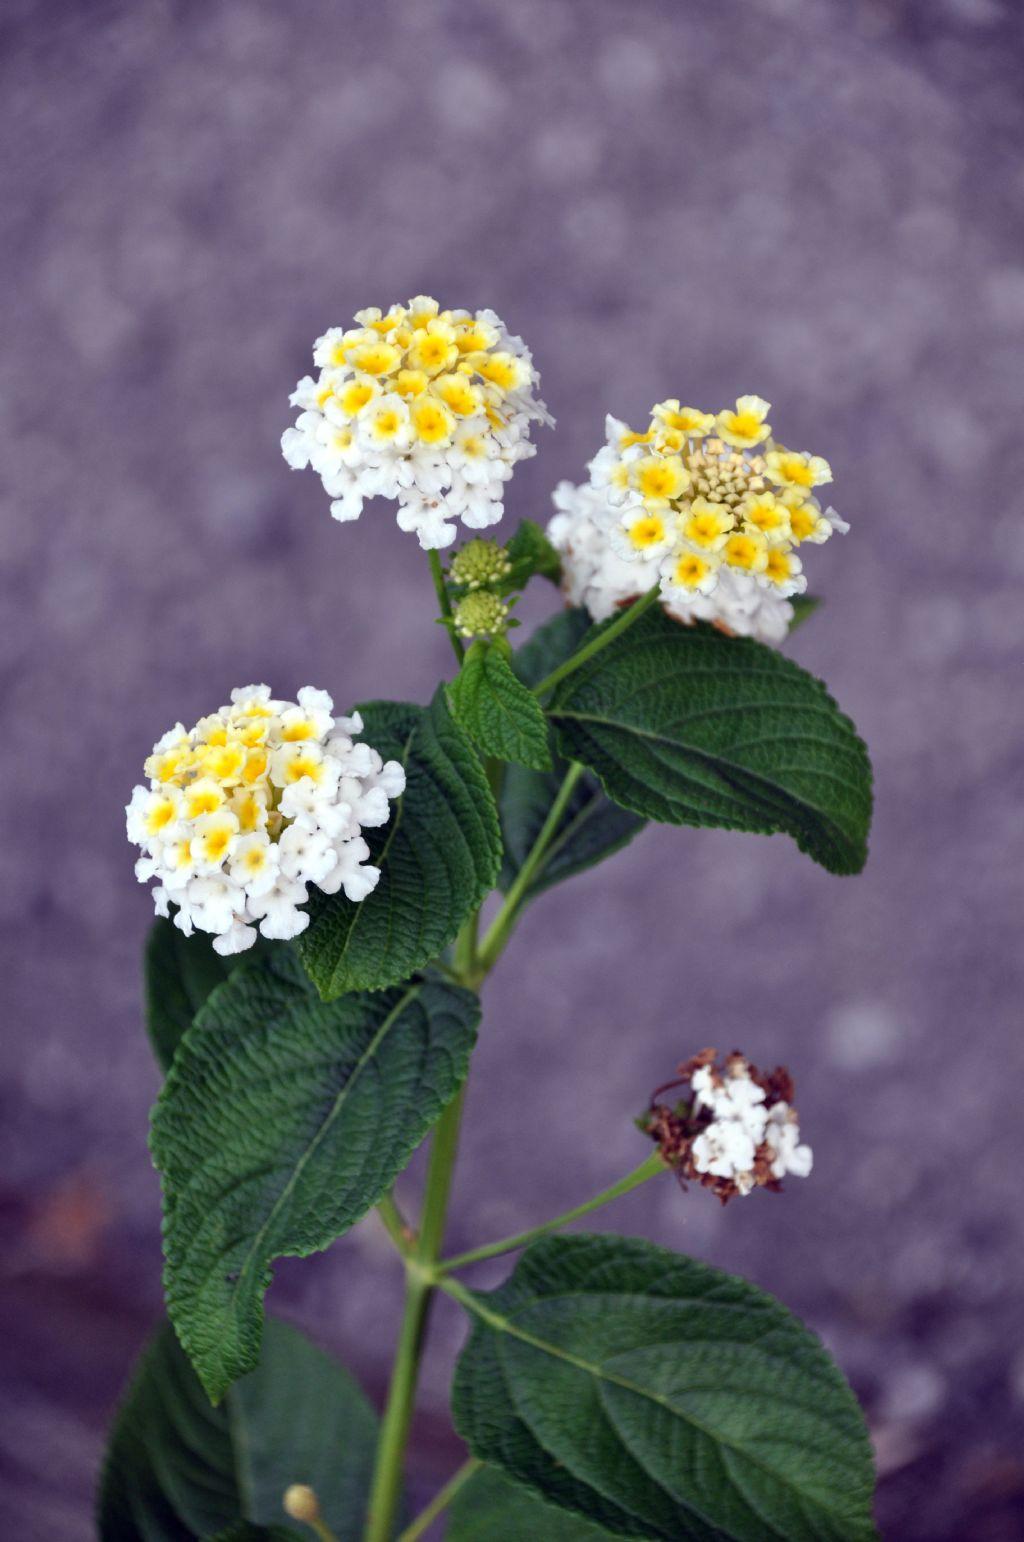 Lantana camara (cultivar) (Verbenaceae)